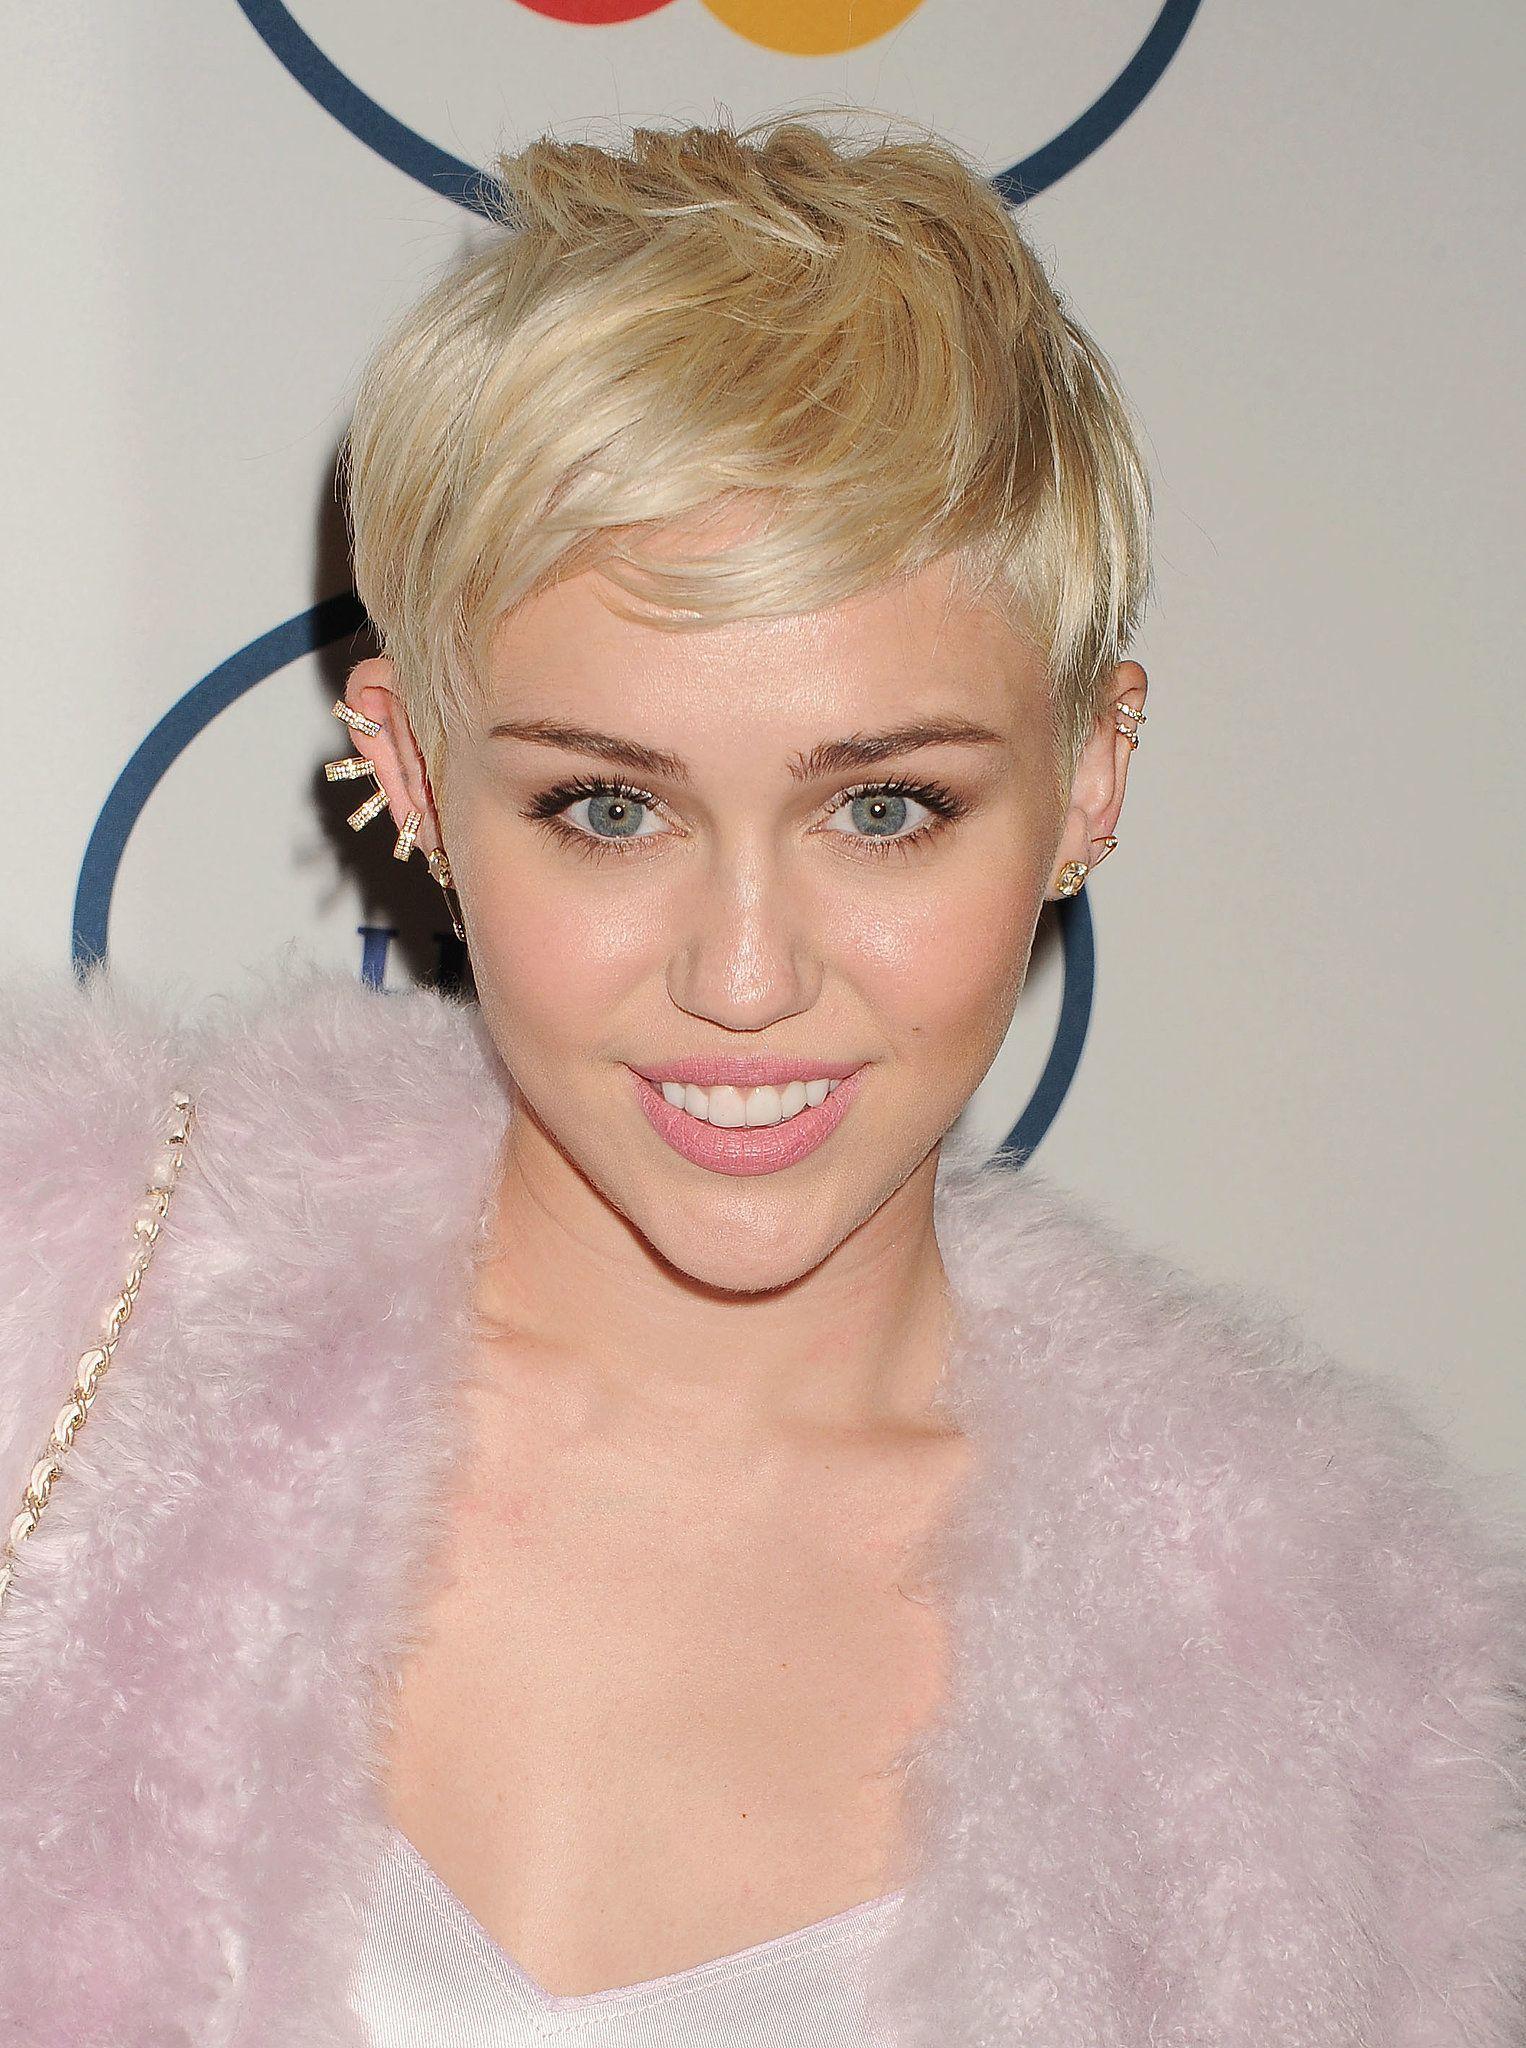 Miley Cyrus Miley Cyrus Cheveux, Coiffure et Maquillage